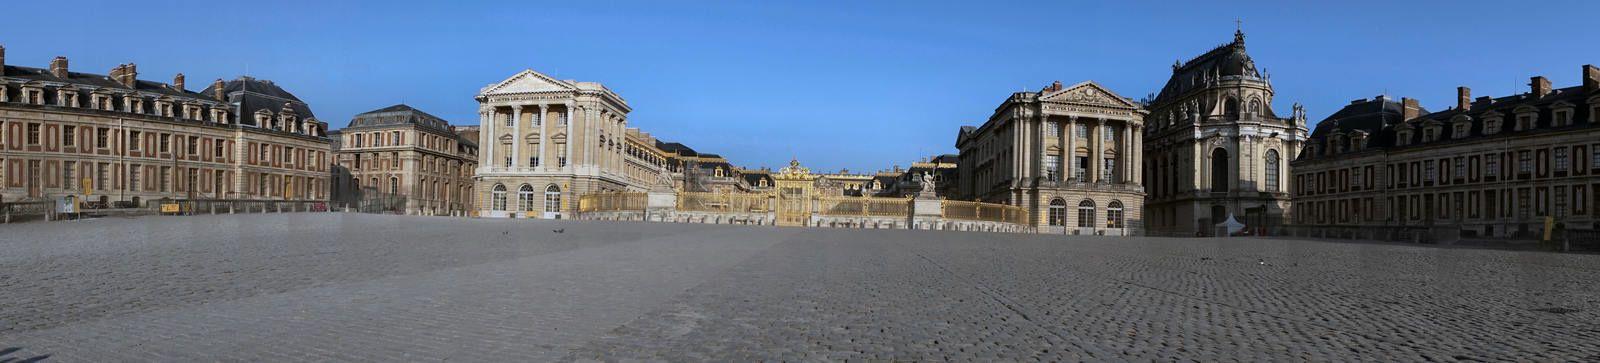 Versailles panorama III